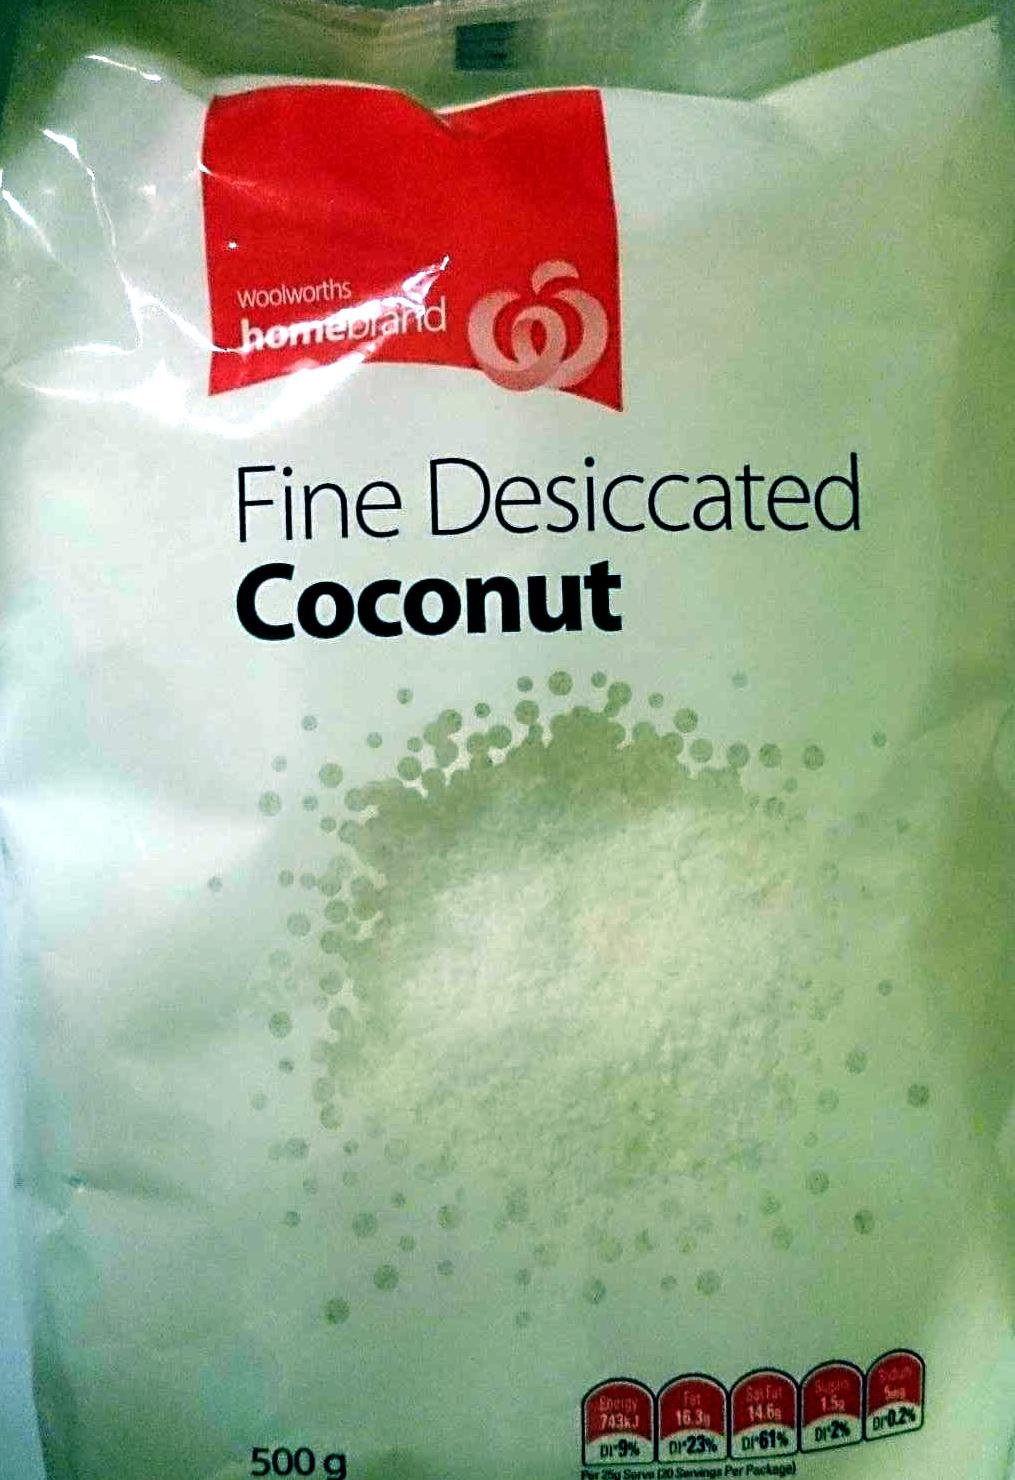 Fine Desiccated Coconut - Product - en